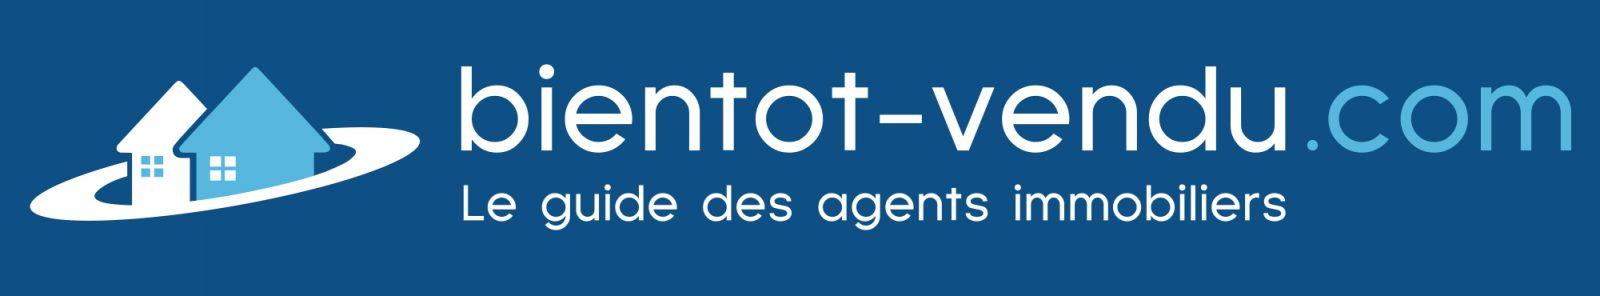 Logo Bientot-vendu